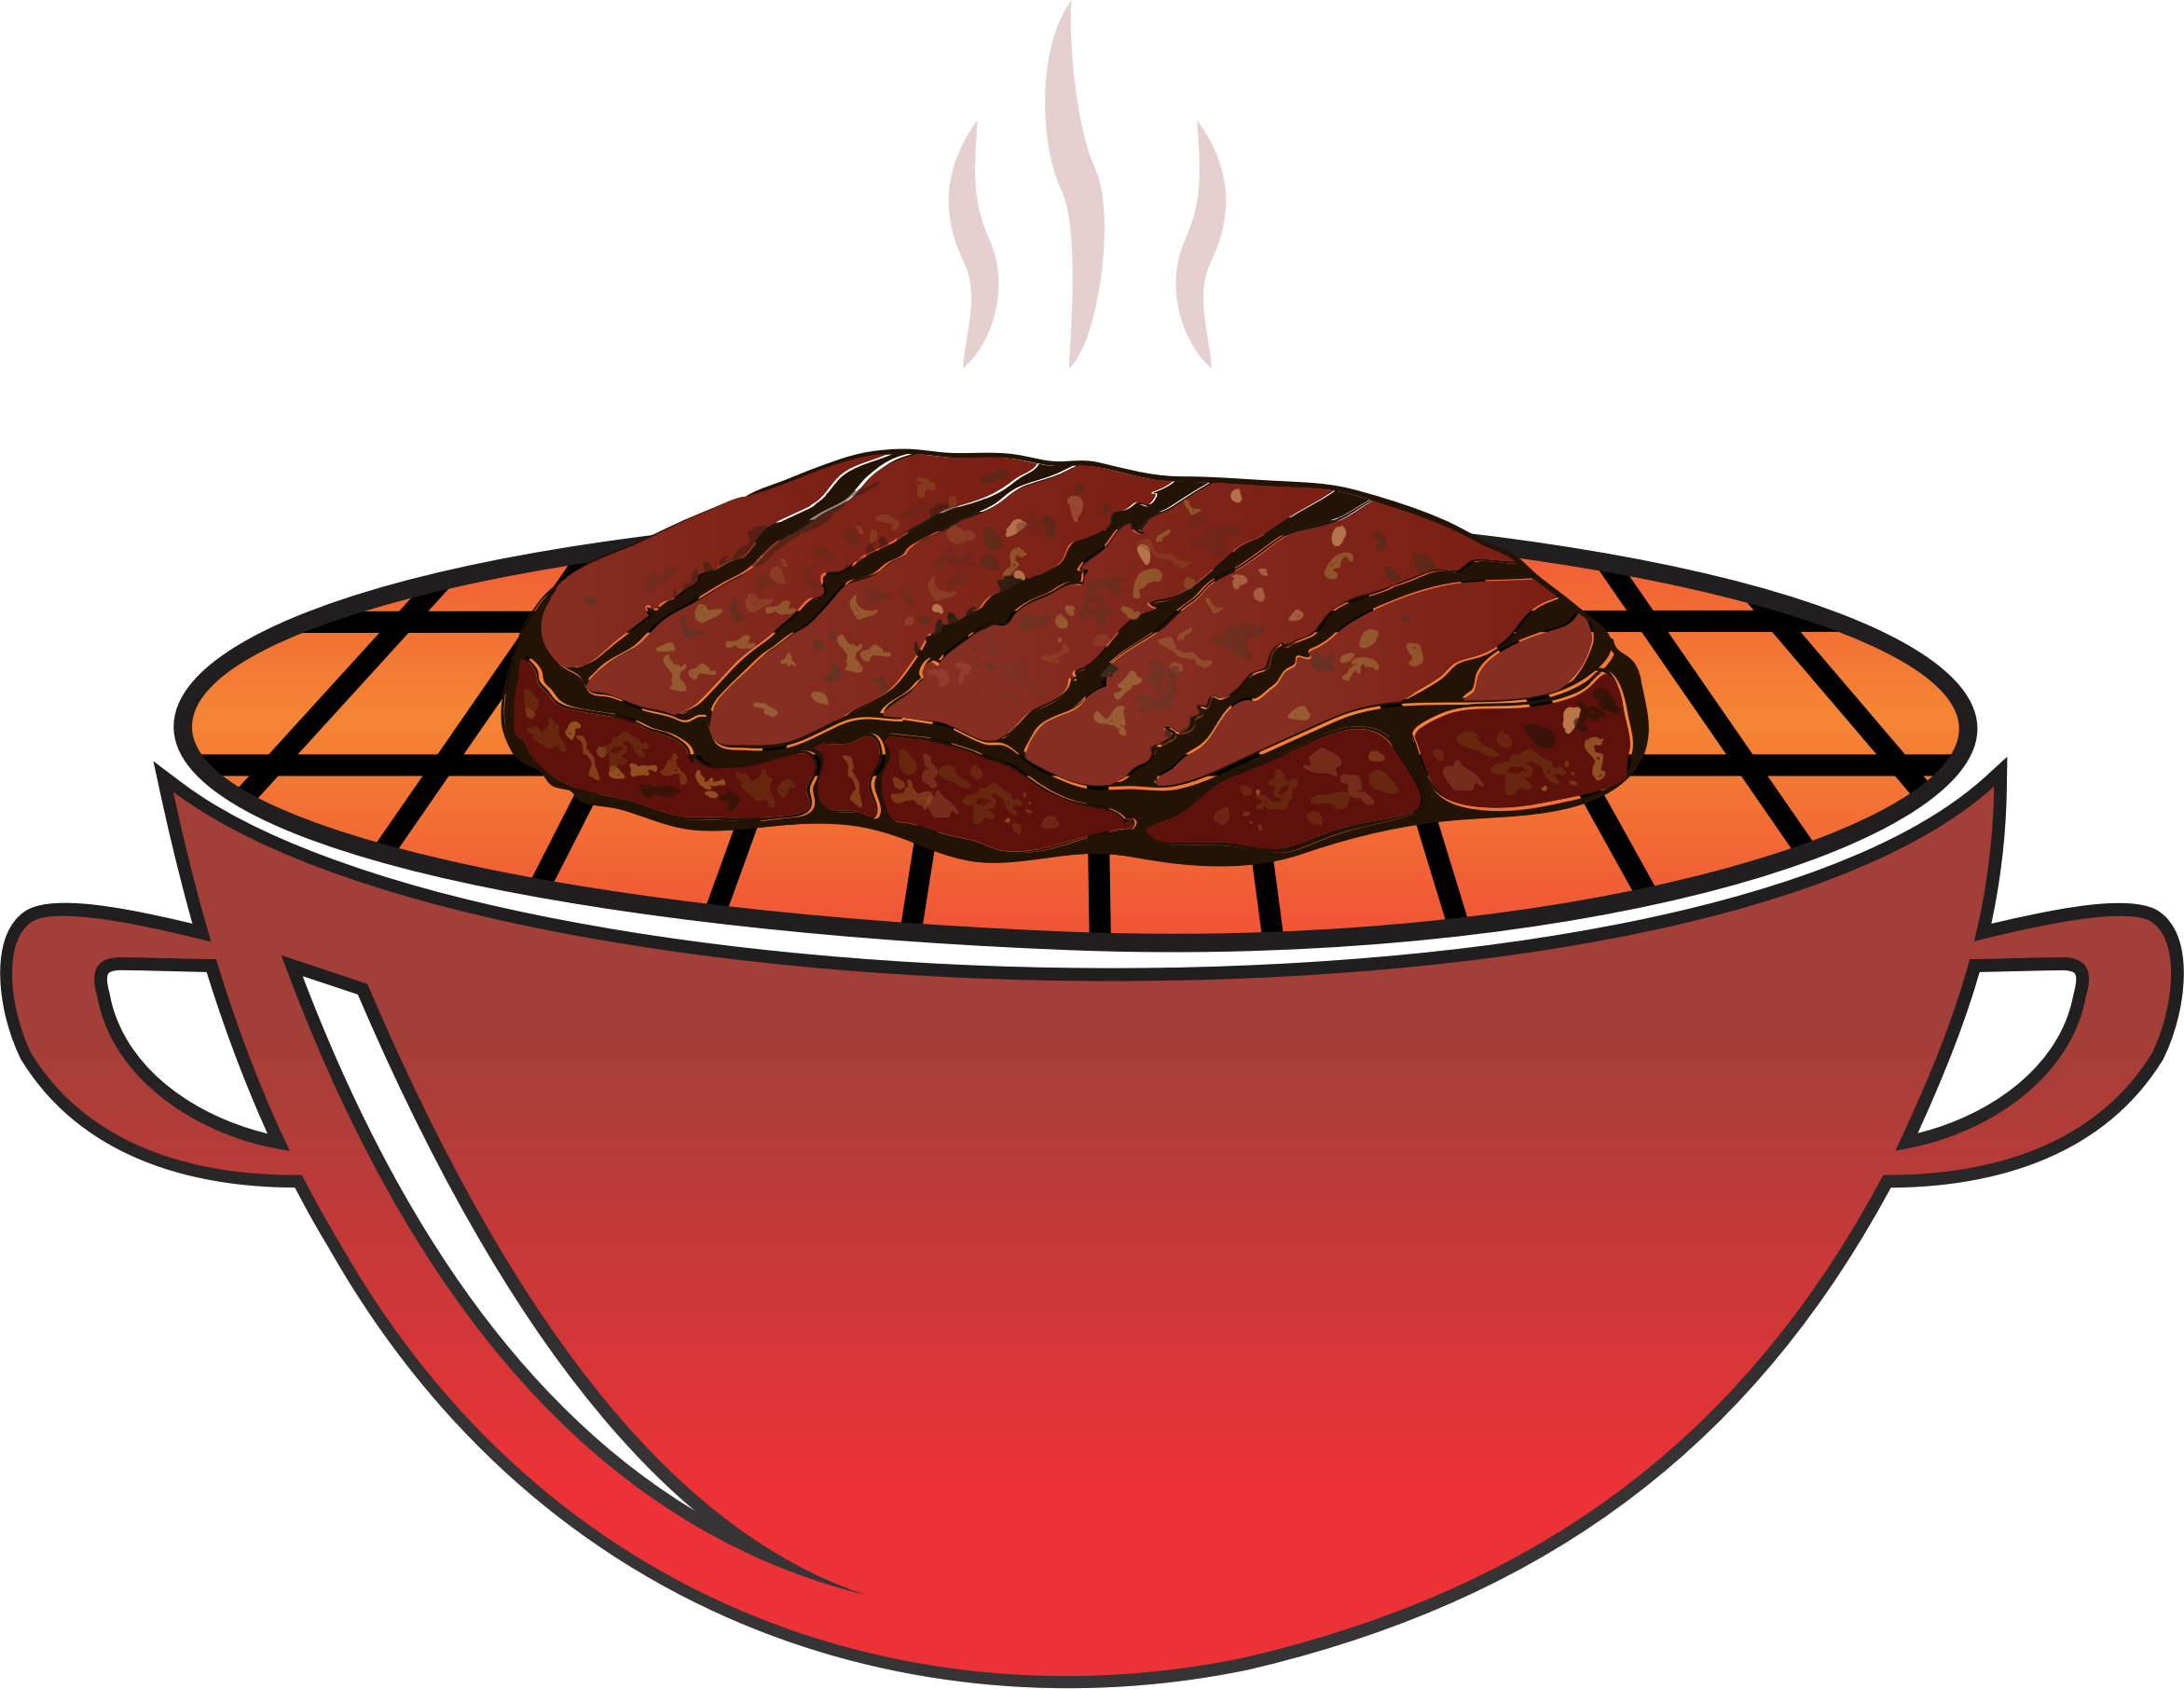 Grilled steak big image. Clipart fall bbq